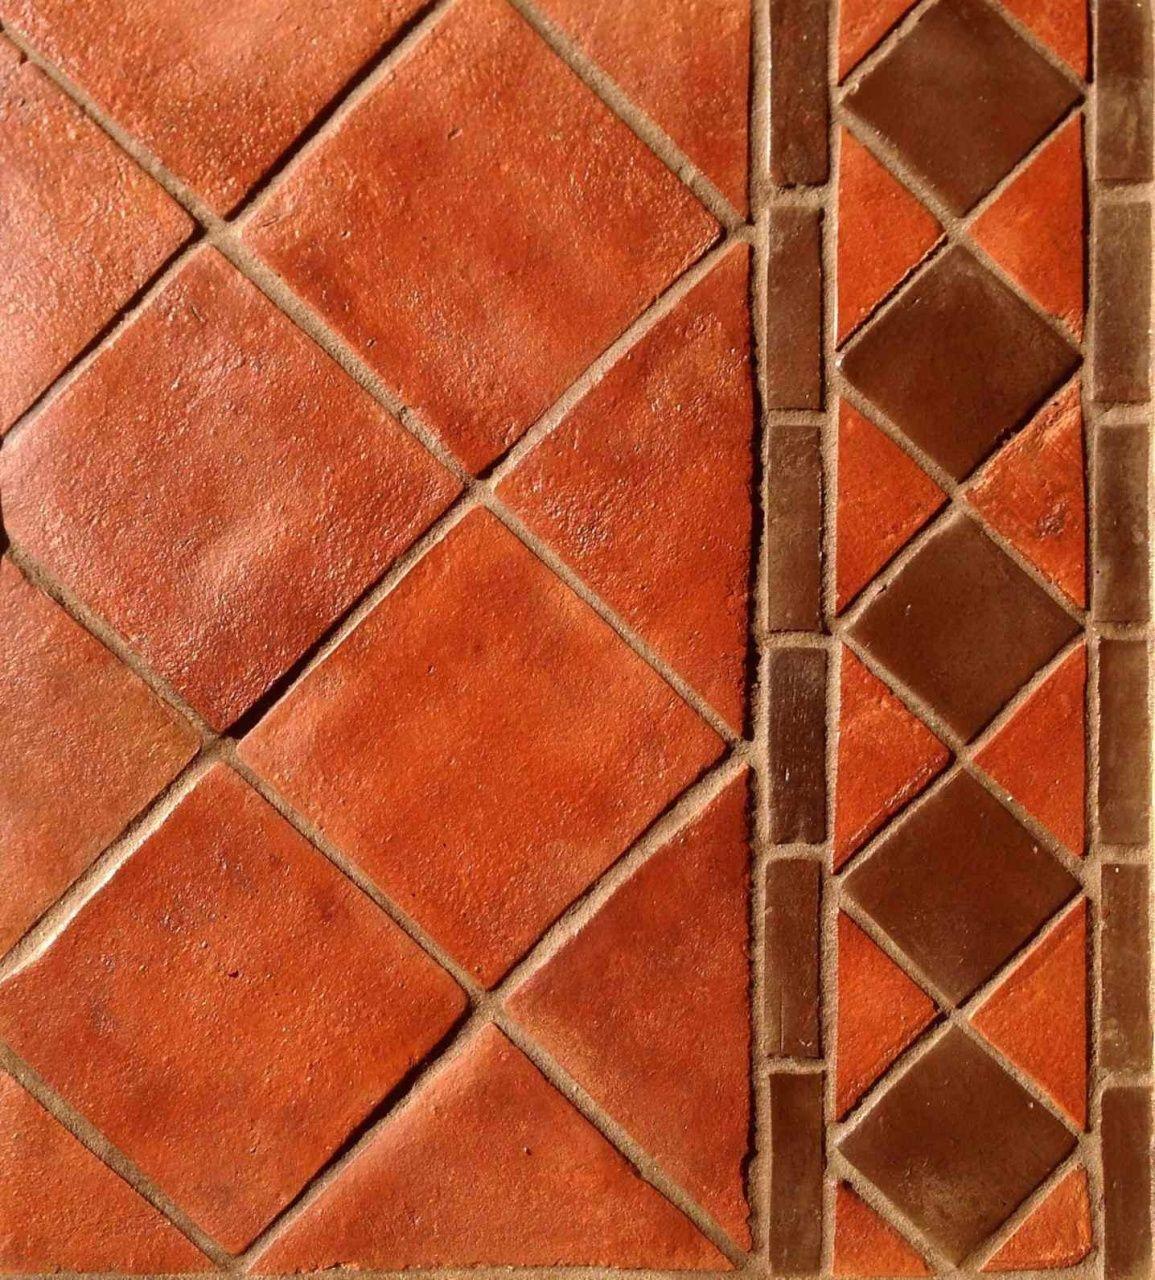 Discontinued Ceramic Tile For Sale In 2020 Terracotta Floor Tile Floor Brick Flooring